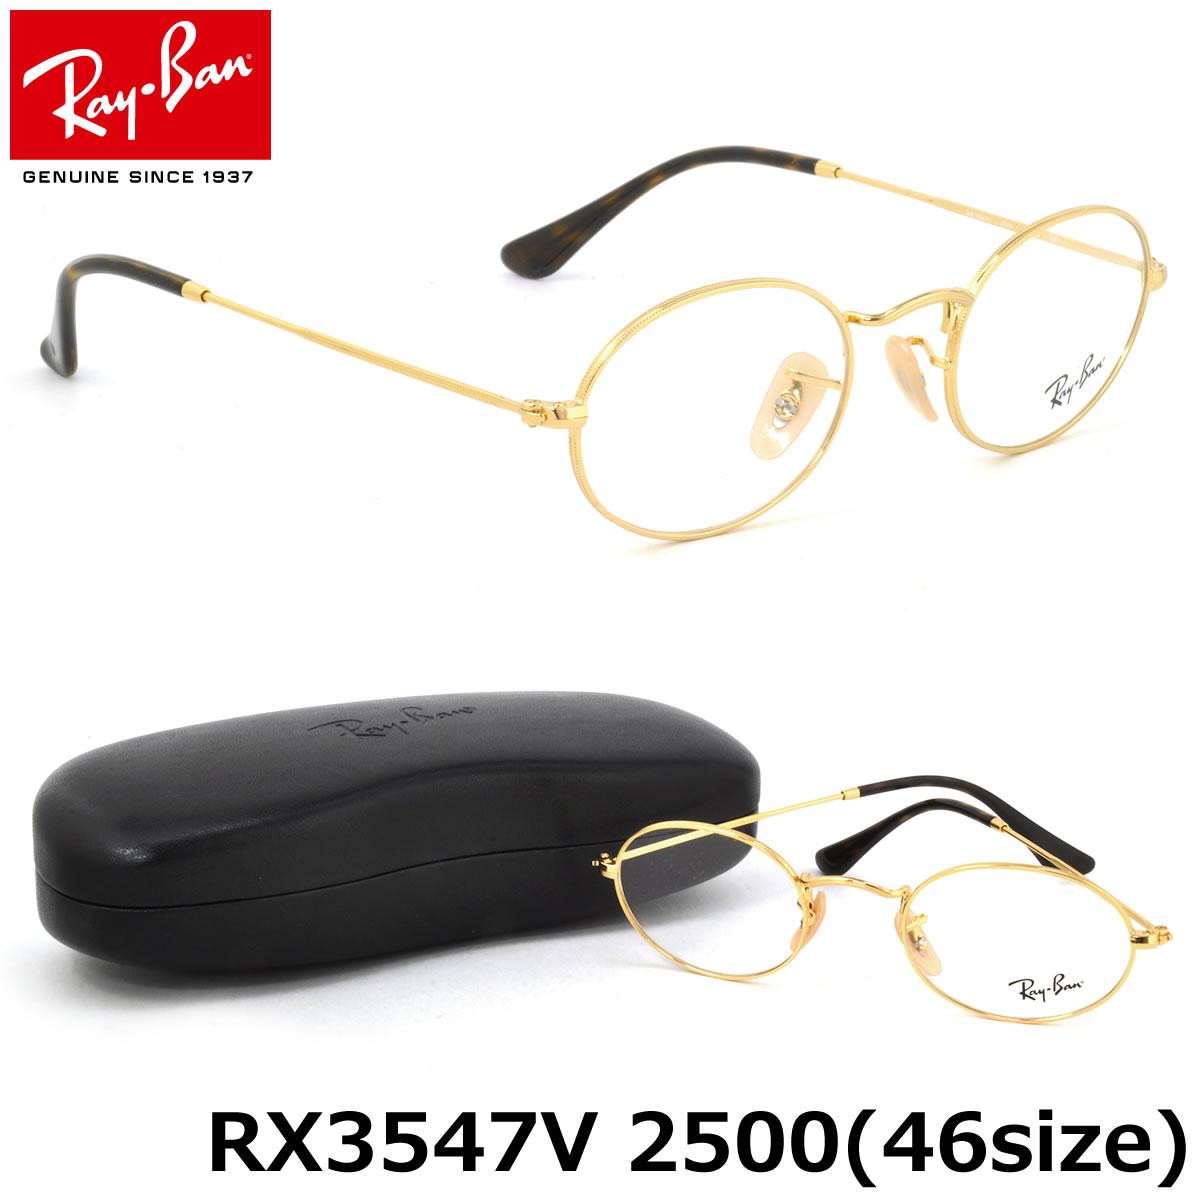 77be2df05f4cd Ray-Ban glasses frame Ray-Ban RX3547V 2500 46 size OVAL OPTICS-maru glasses  frame round Ray-Ban RAYBAN men gap Dis